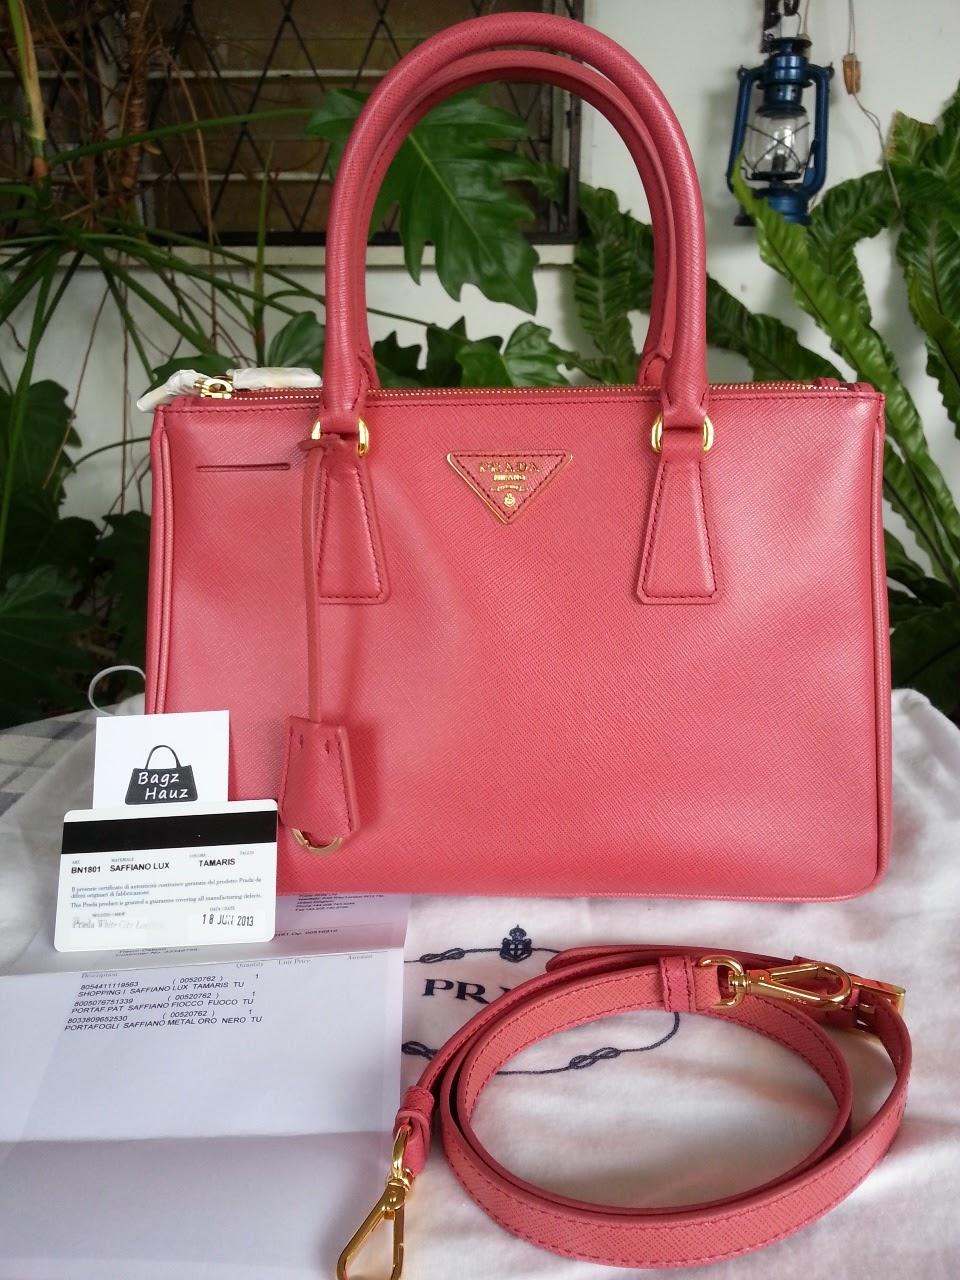 2e387abdac1d Bagz Hauz Fashion  BN1801 Saffiano Lux ~ Limited Edition Colors In ...